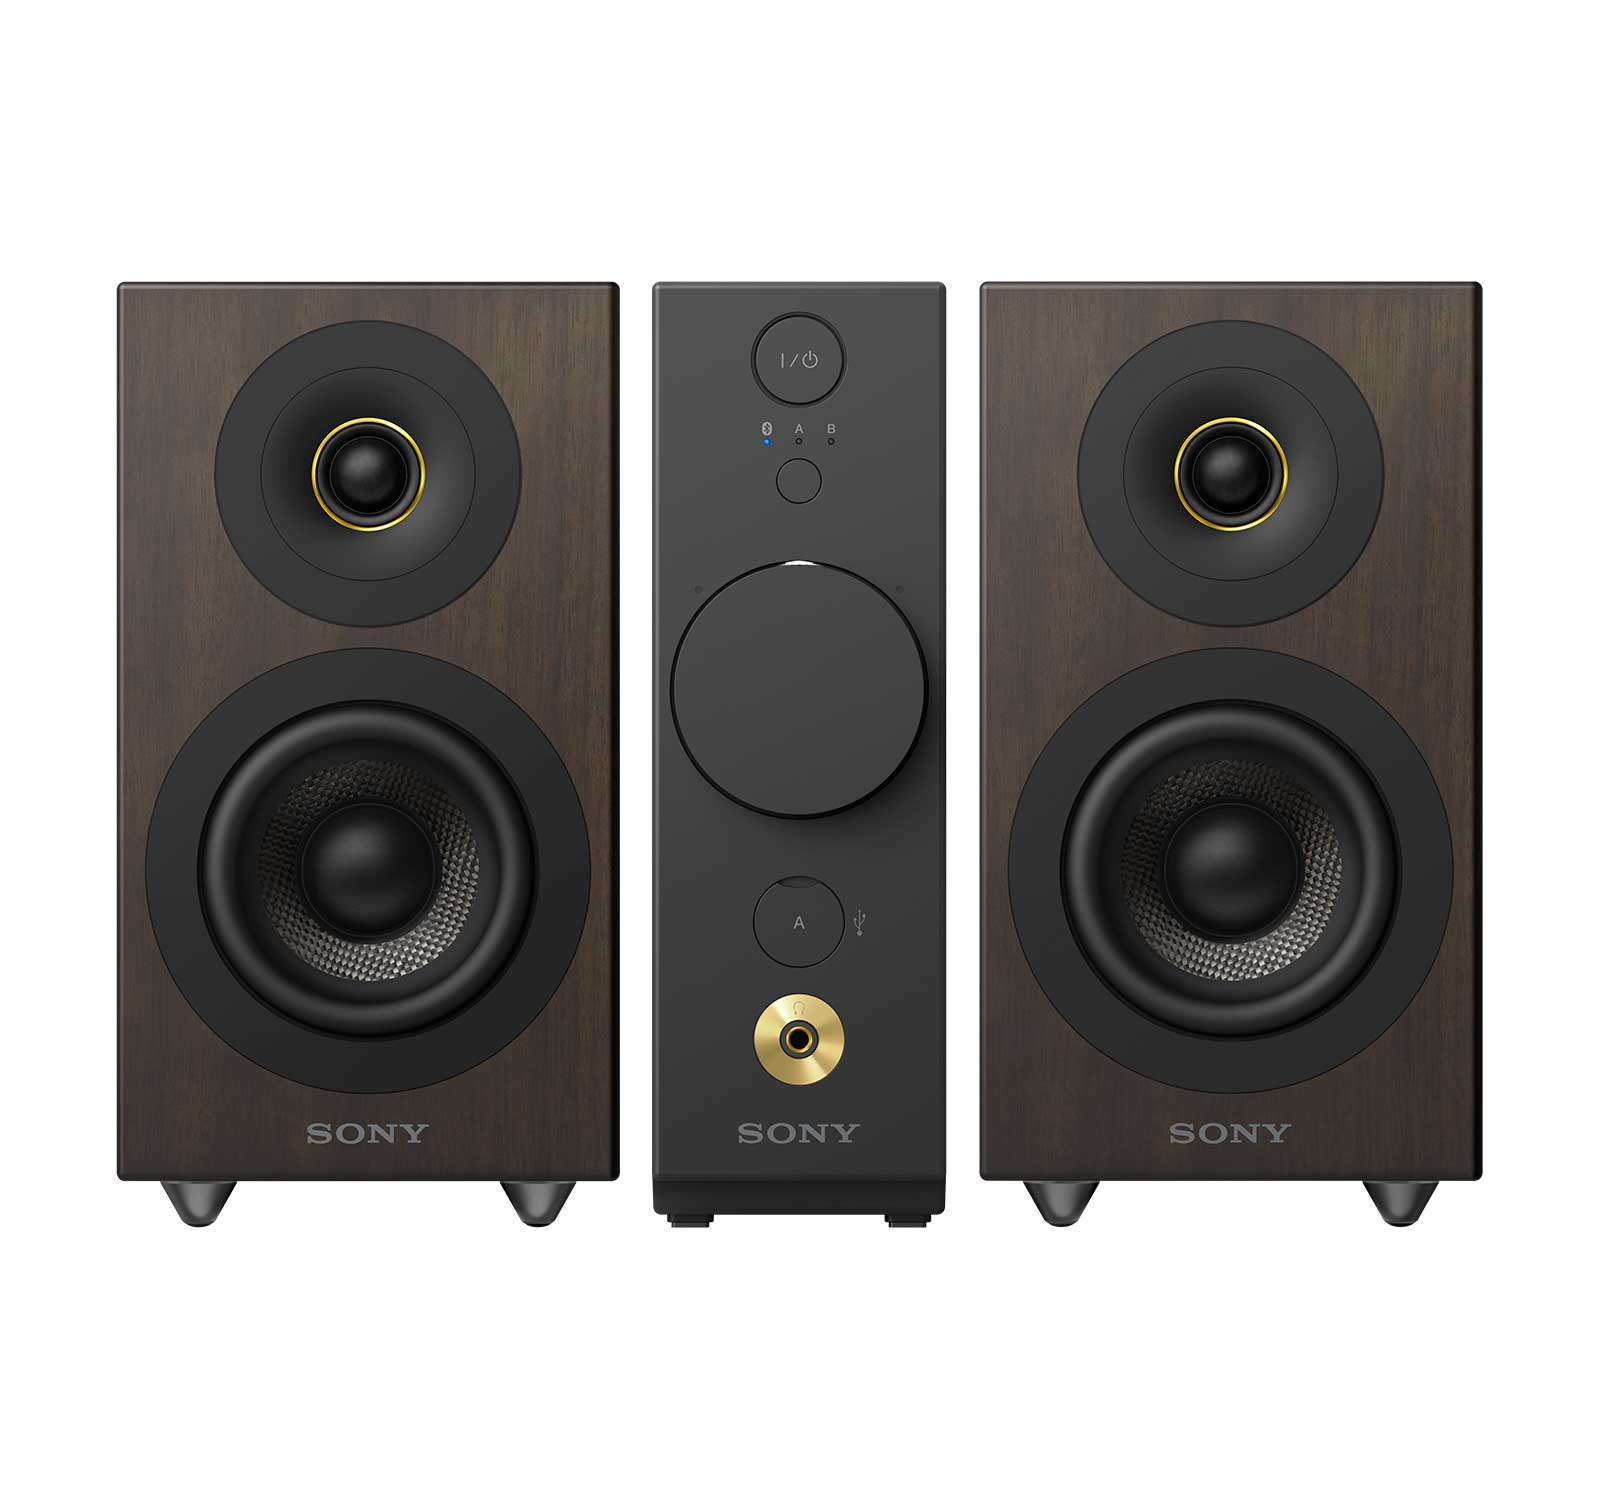 Sony CAS1 Desktop Audio System